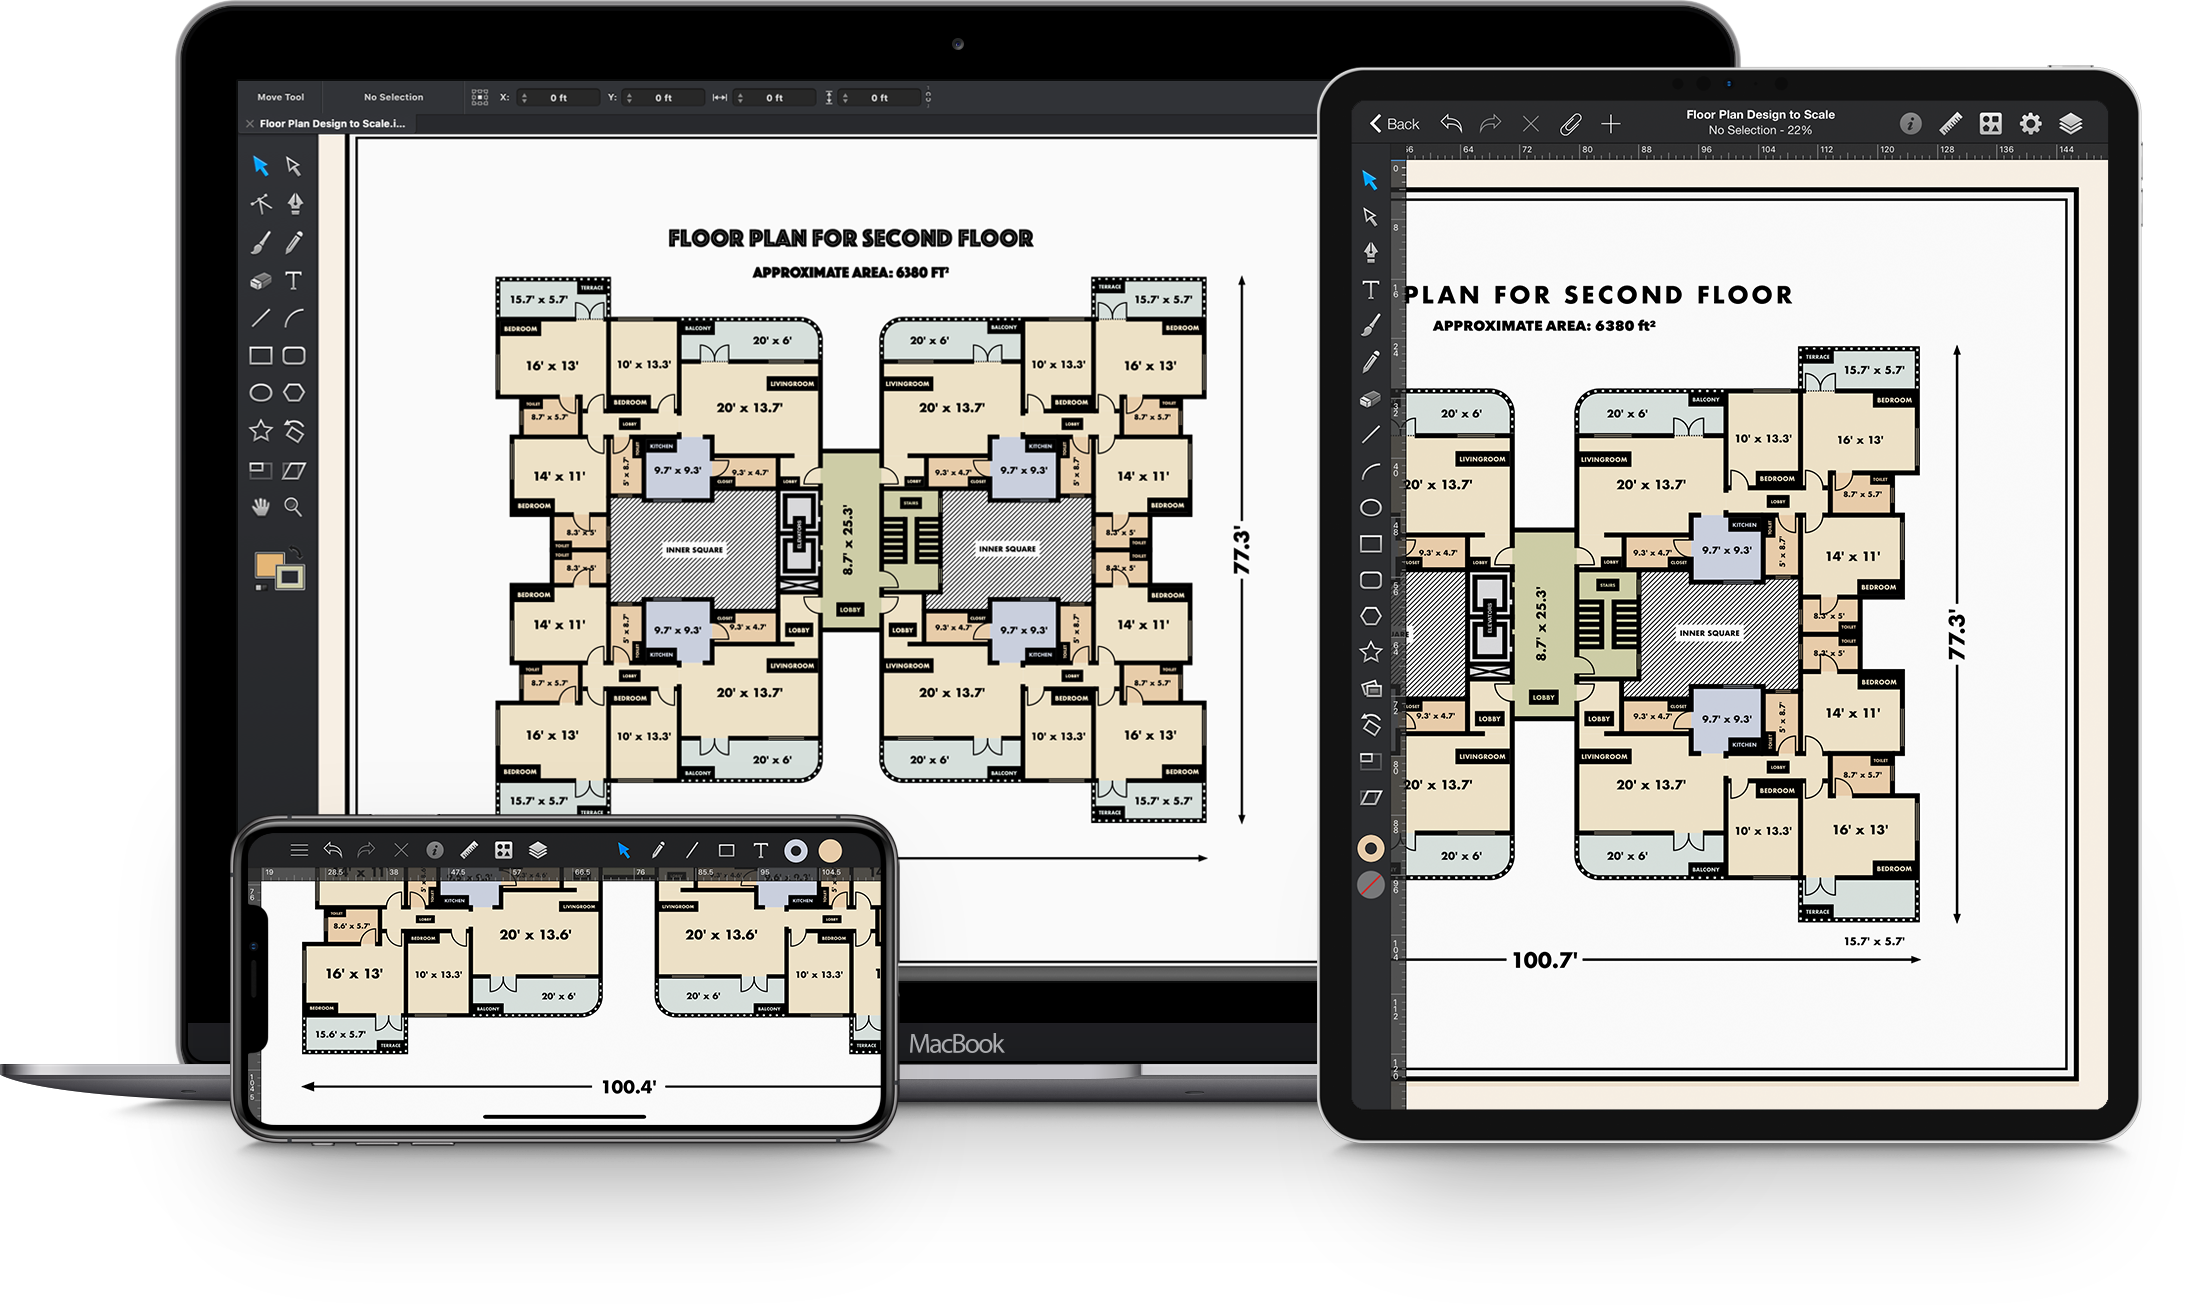 Graphic - iPhone Illustration and Graphic Design